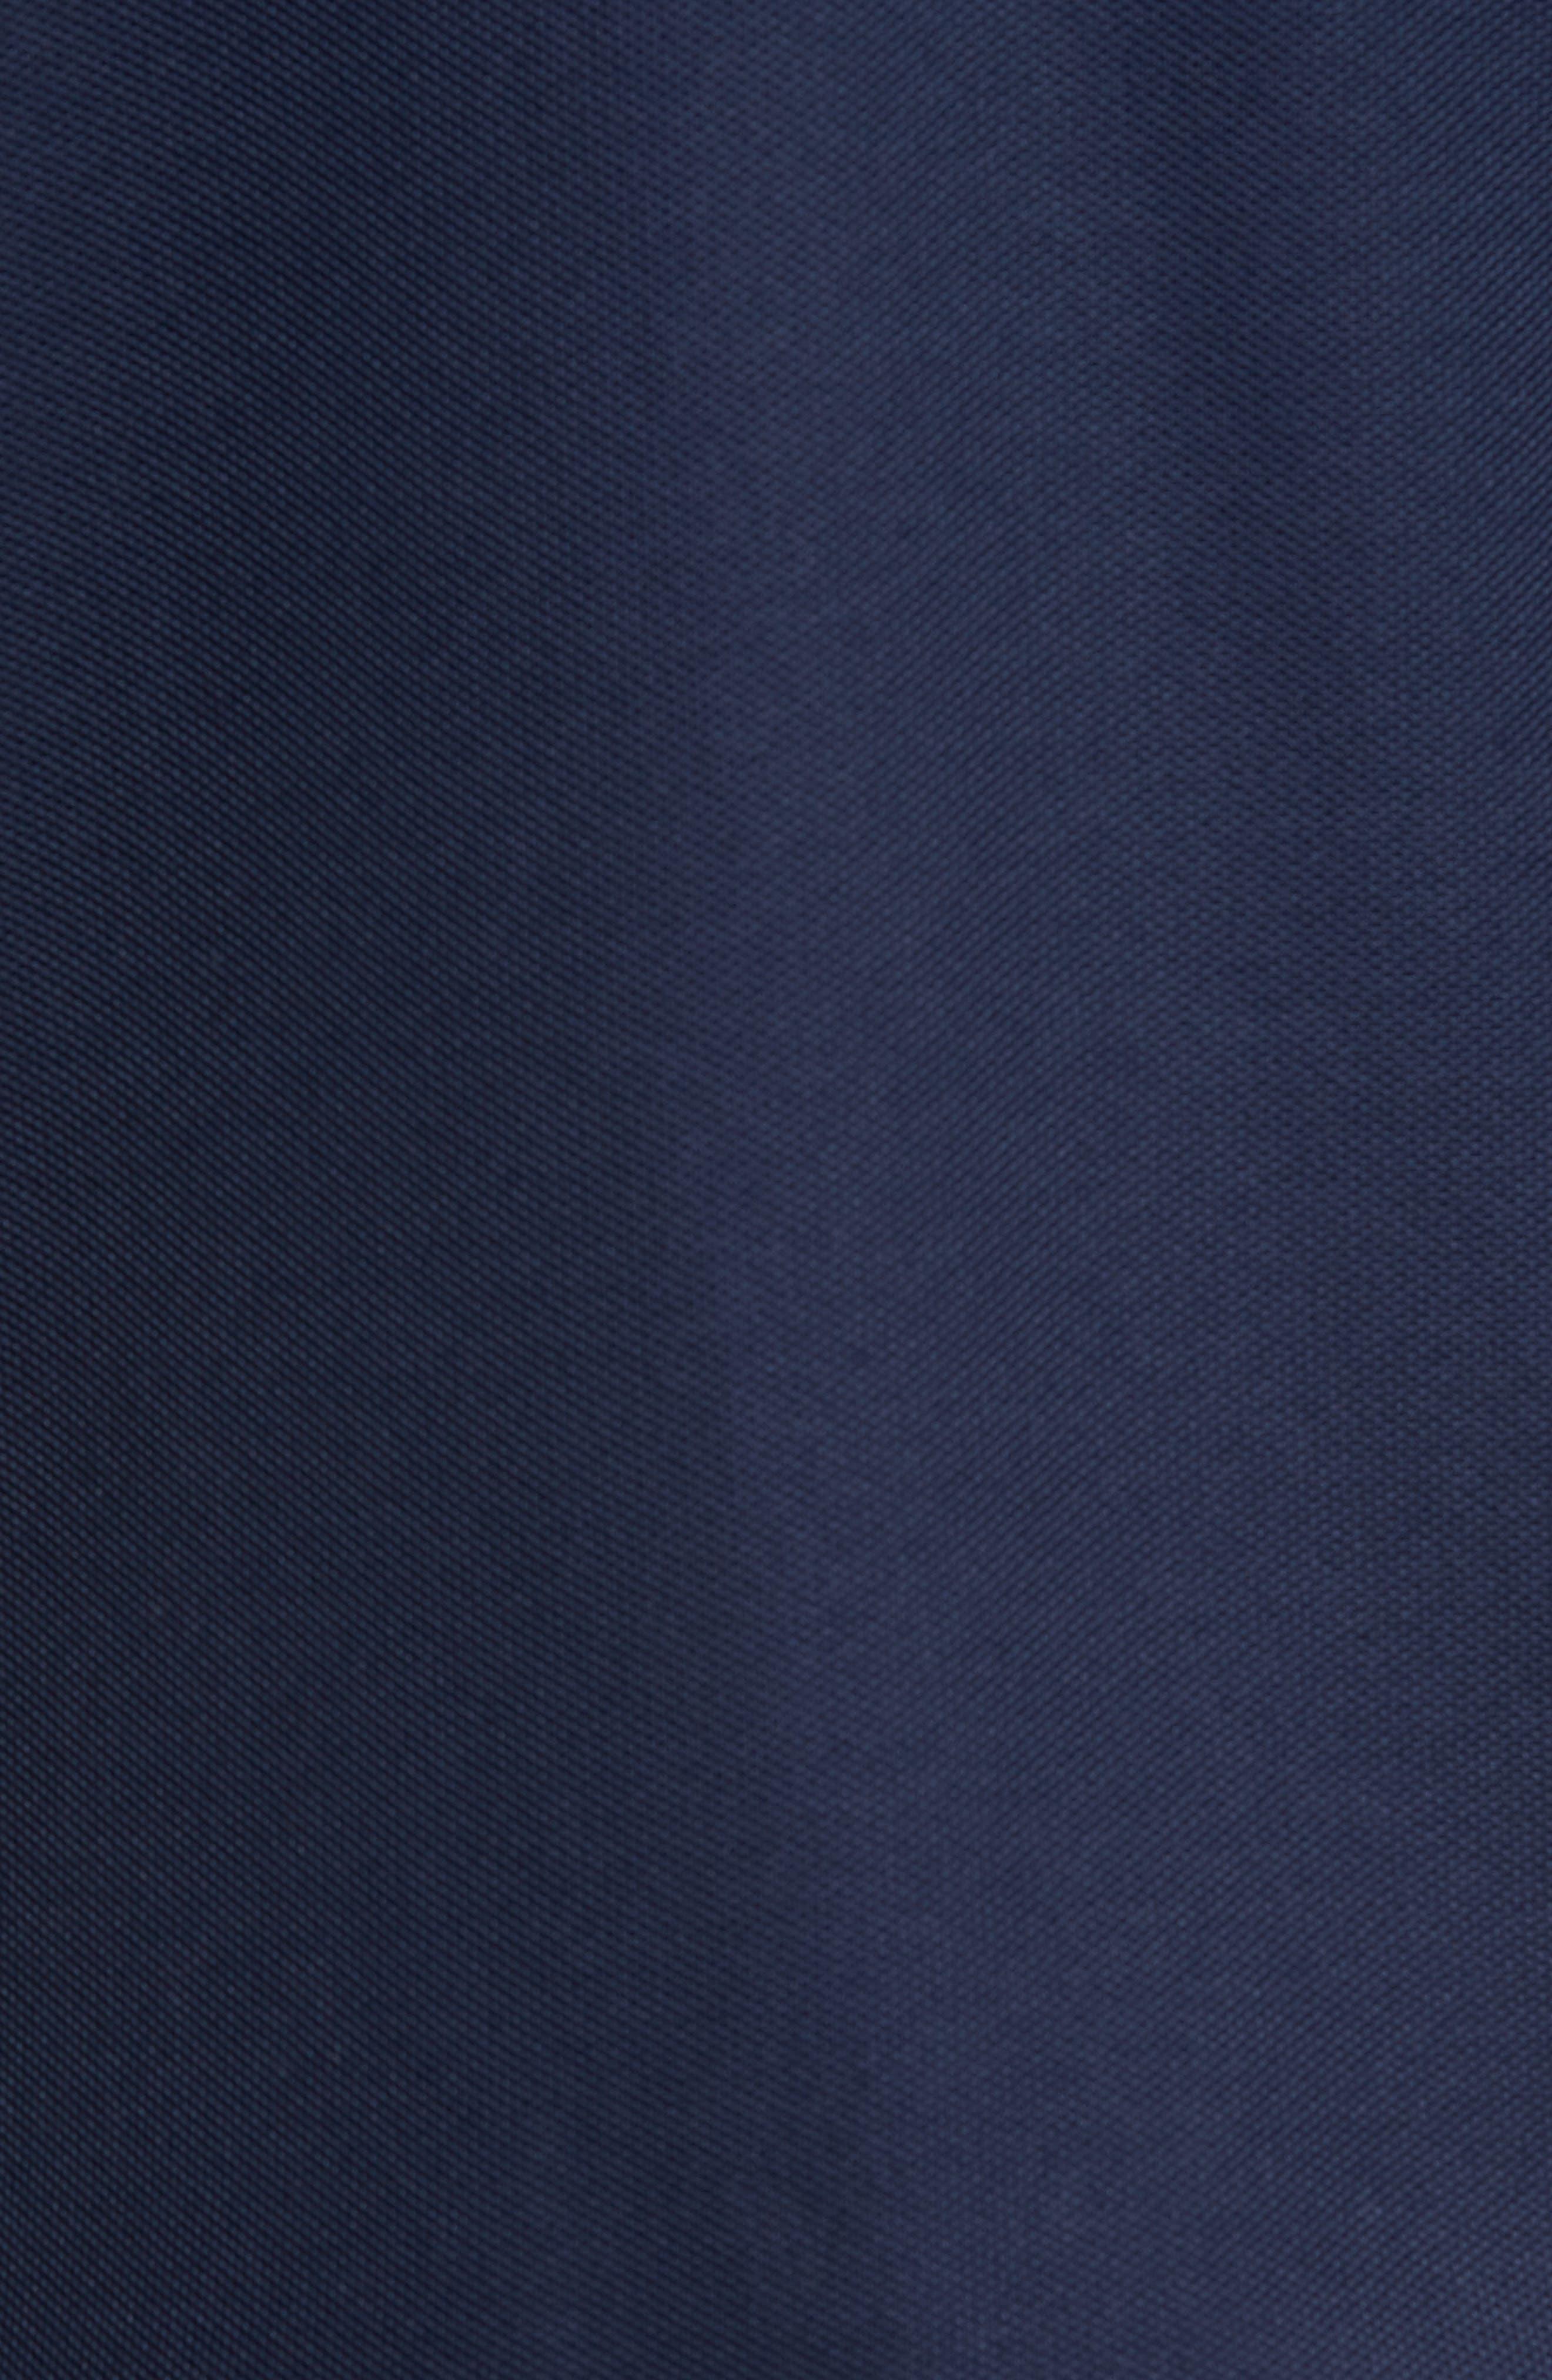 Emfielder Long Sleeve Polo,                             Alternate thumbnail 5, color,                             Blue Note